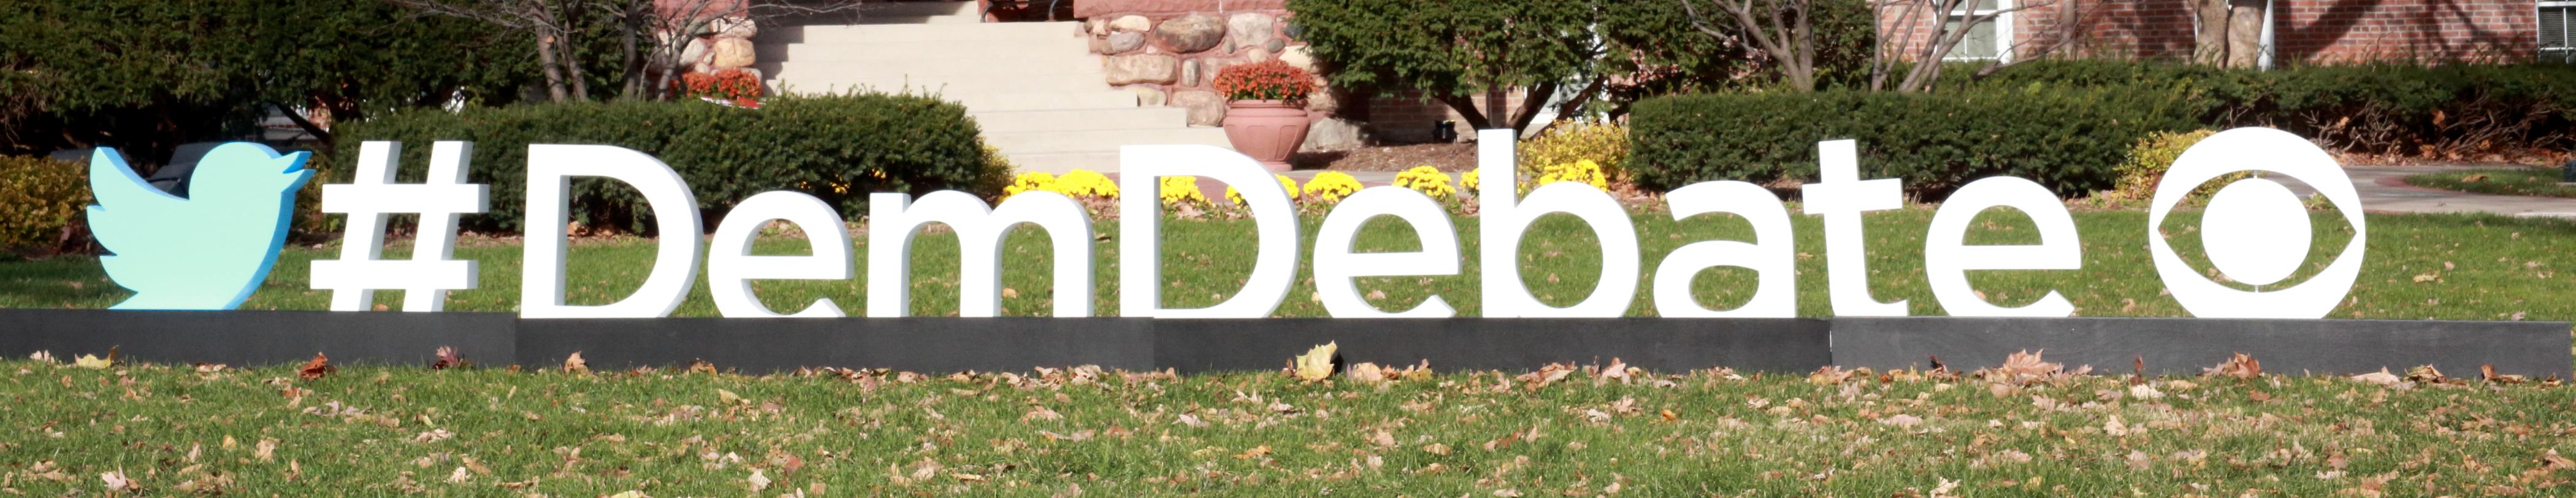 #DemDebate sign